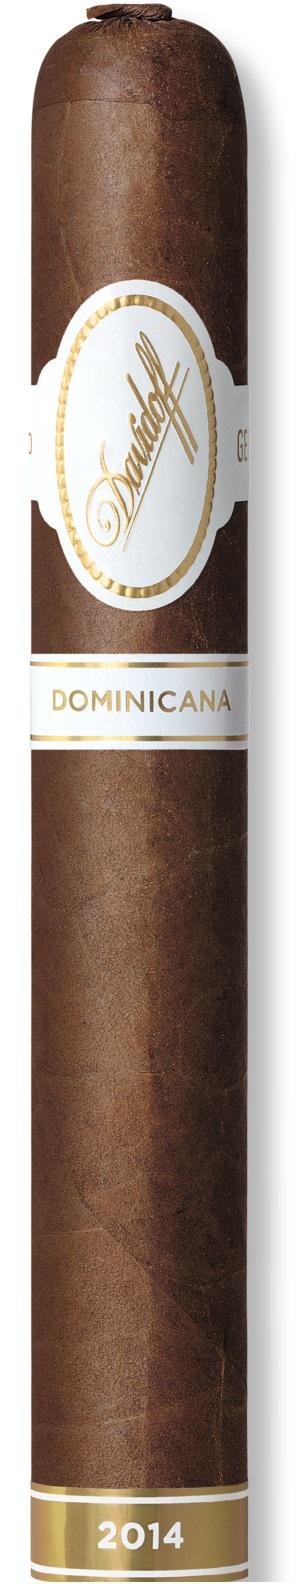 "Davidoff ""2021"" Dominicana Toro"